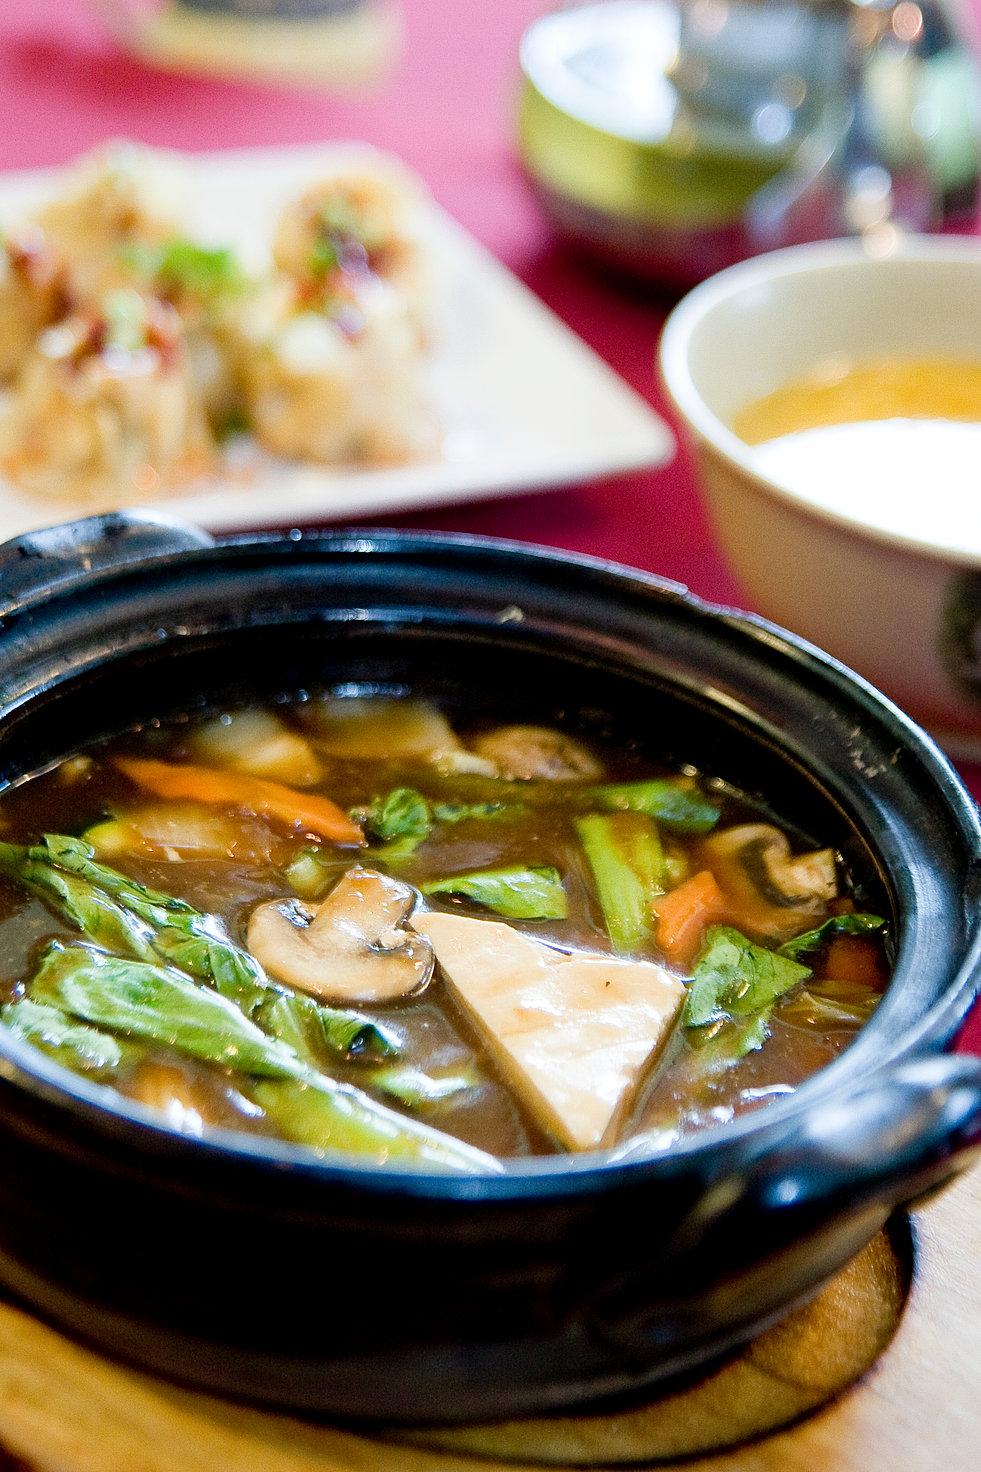 Chinese Delivery Tulsa >> Chopsticks | Chinese Korean Cuisine | Home | Tulsa, OK